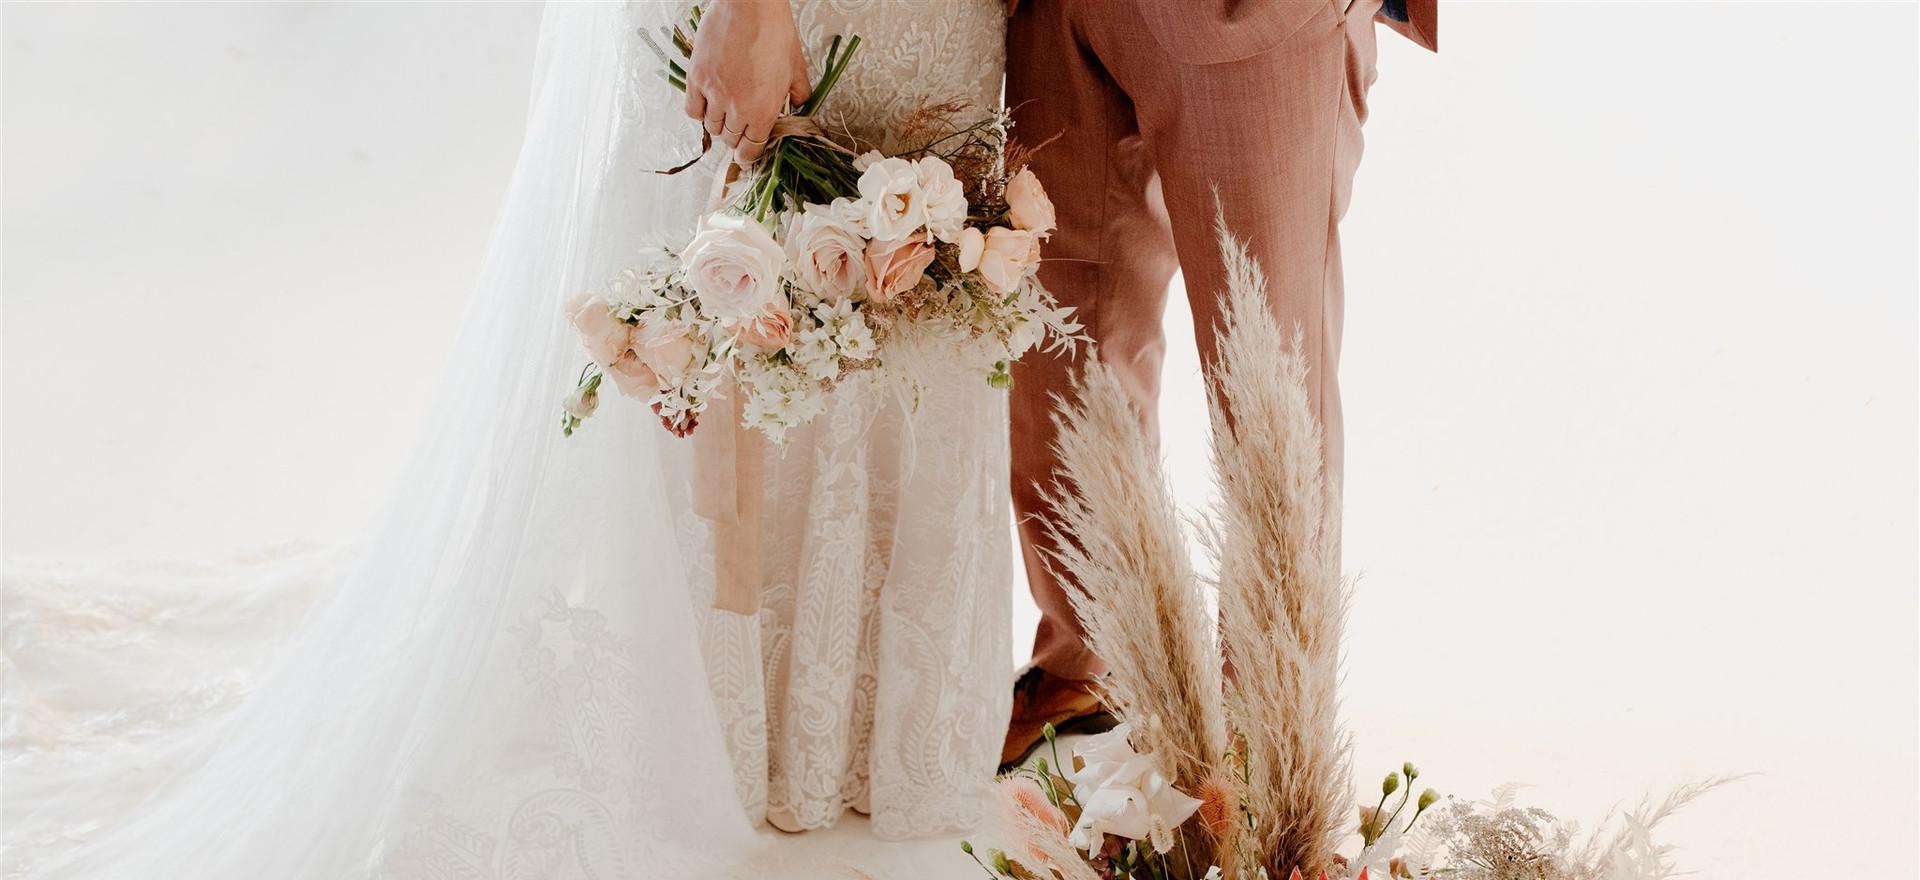 emily-allen-wedding-8887.jpg